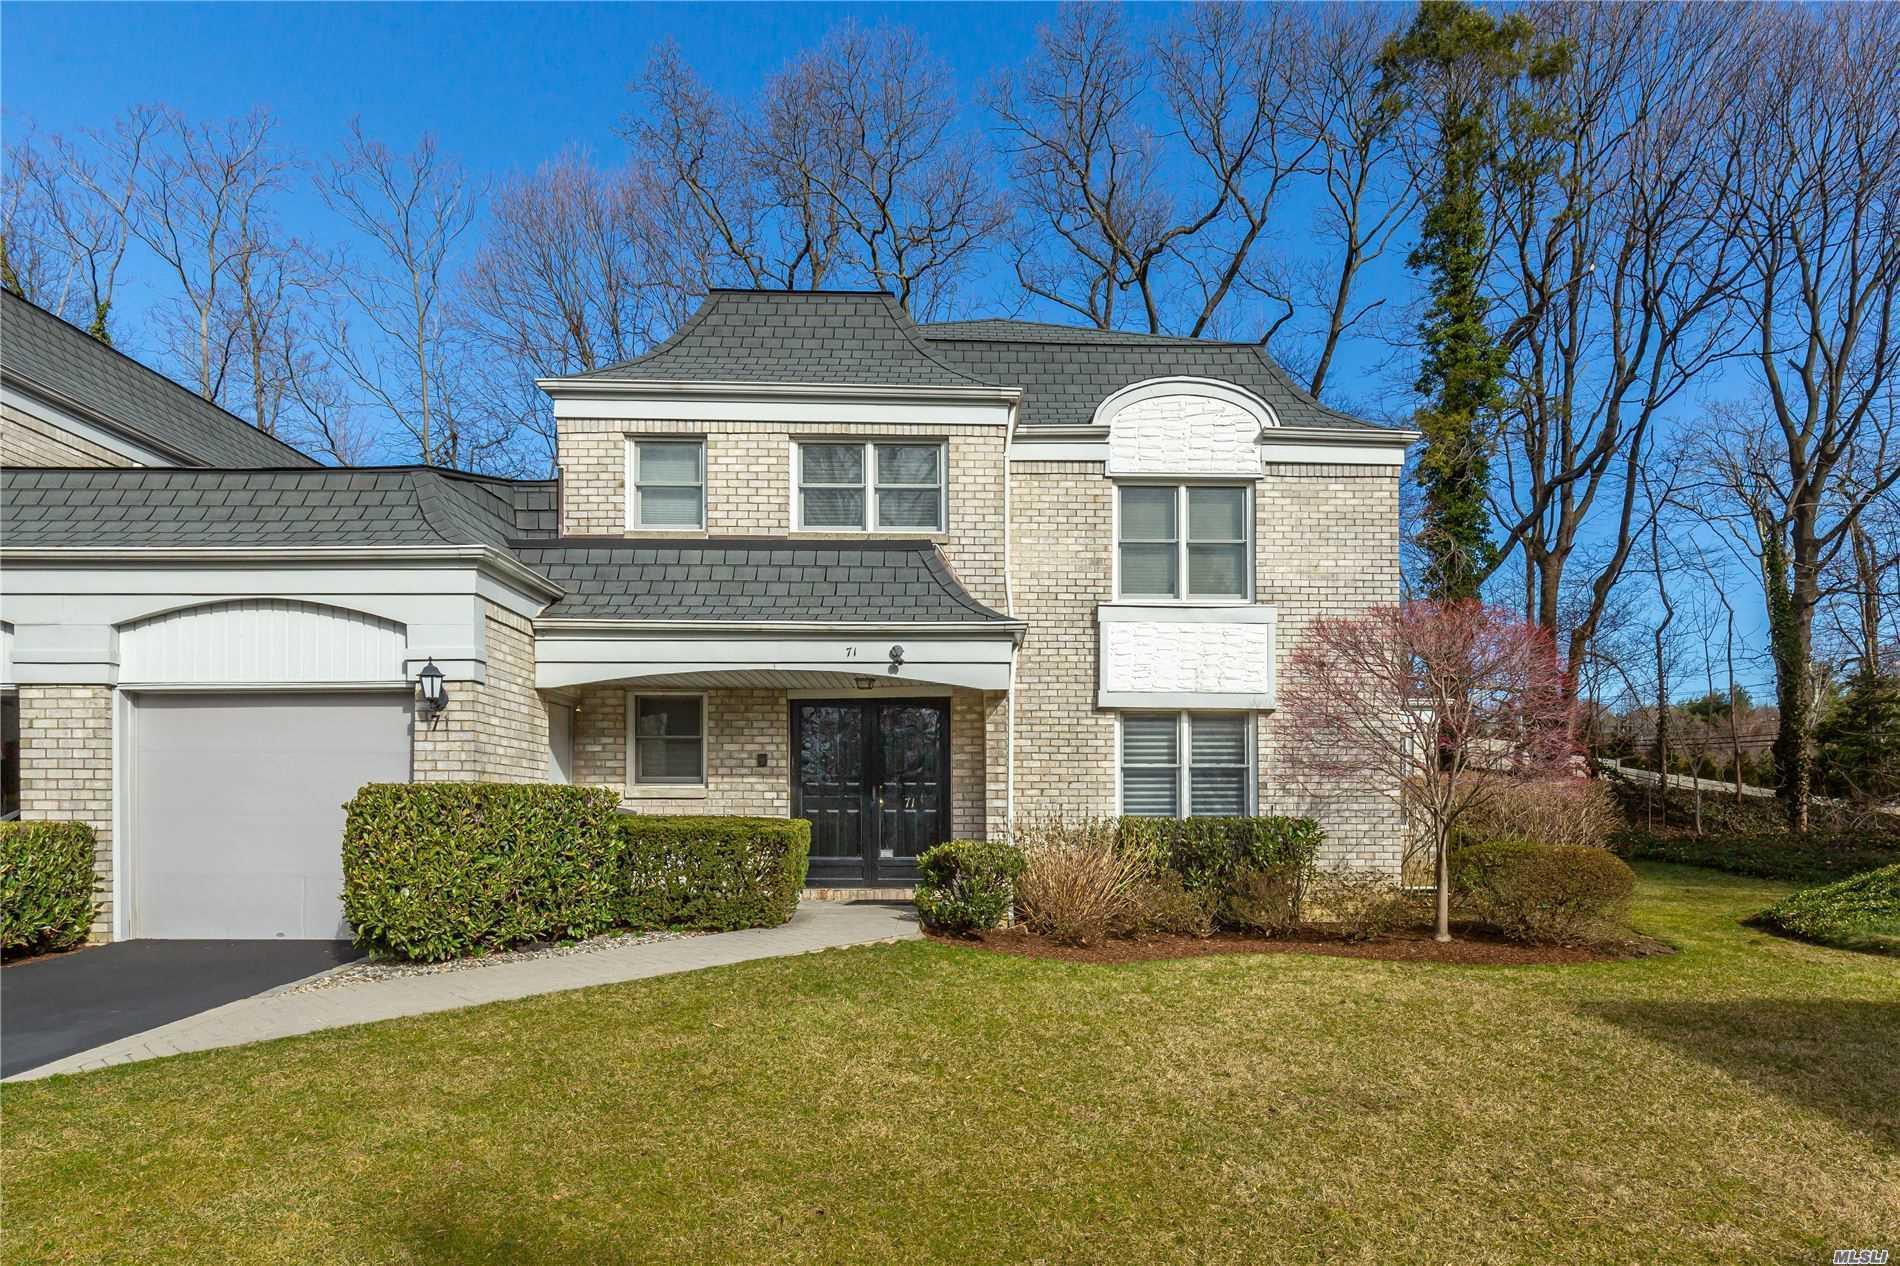 Property for sale at 71 N Fairway Cir, Manhasset,  New York 11030